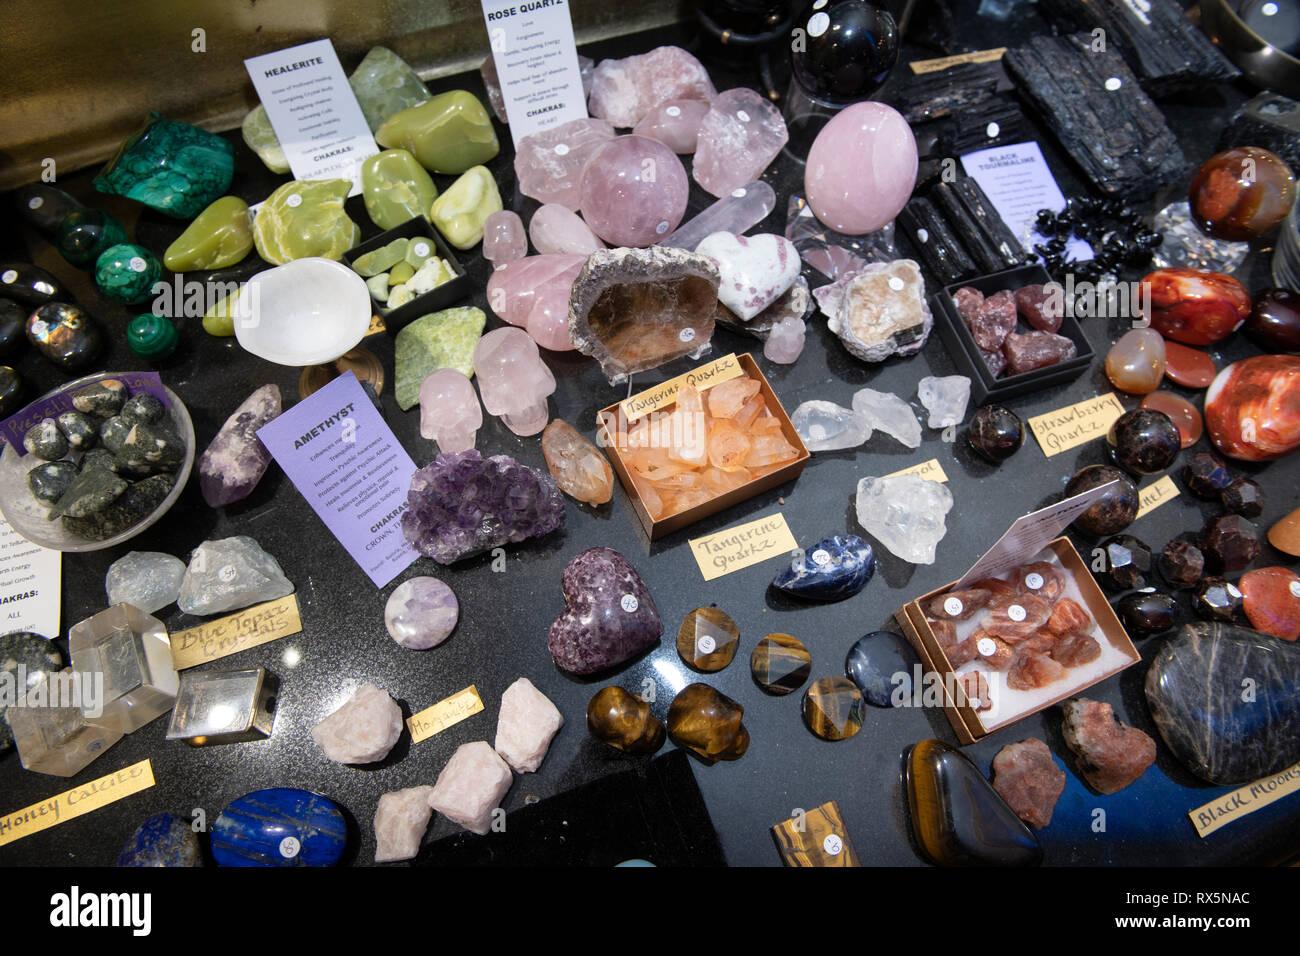 Tangerine Quartz amongst other crystals on sale in Glastonbury, Somerset UK - Stock Image